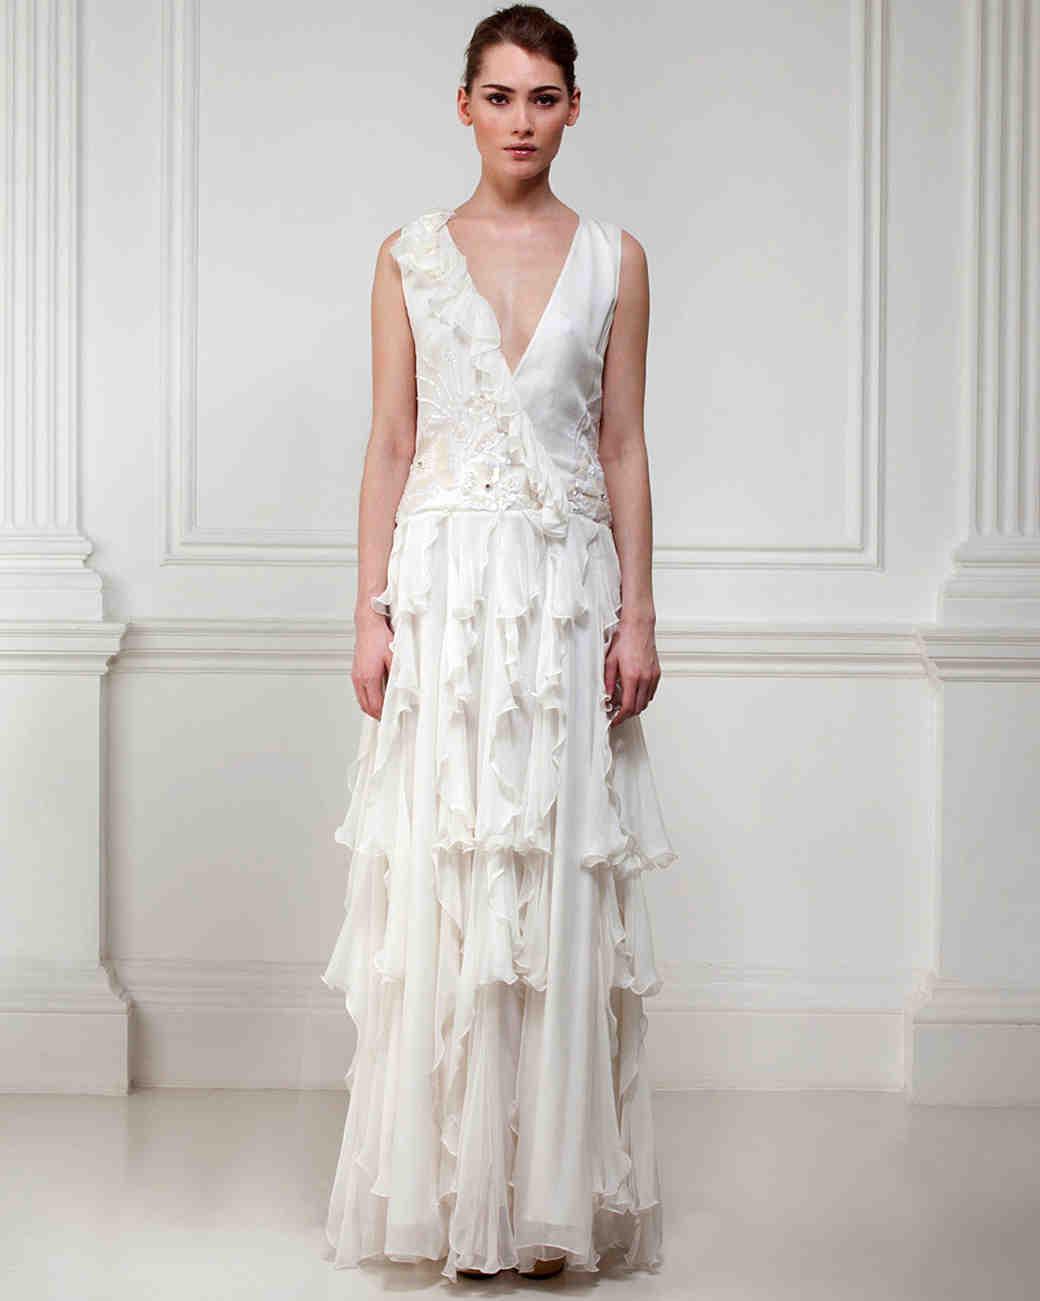 iconic-dresses-matthew-williamson.jpg